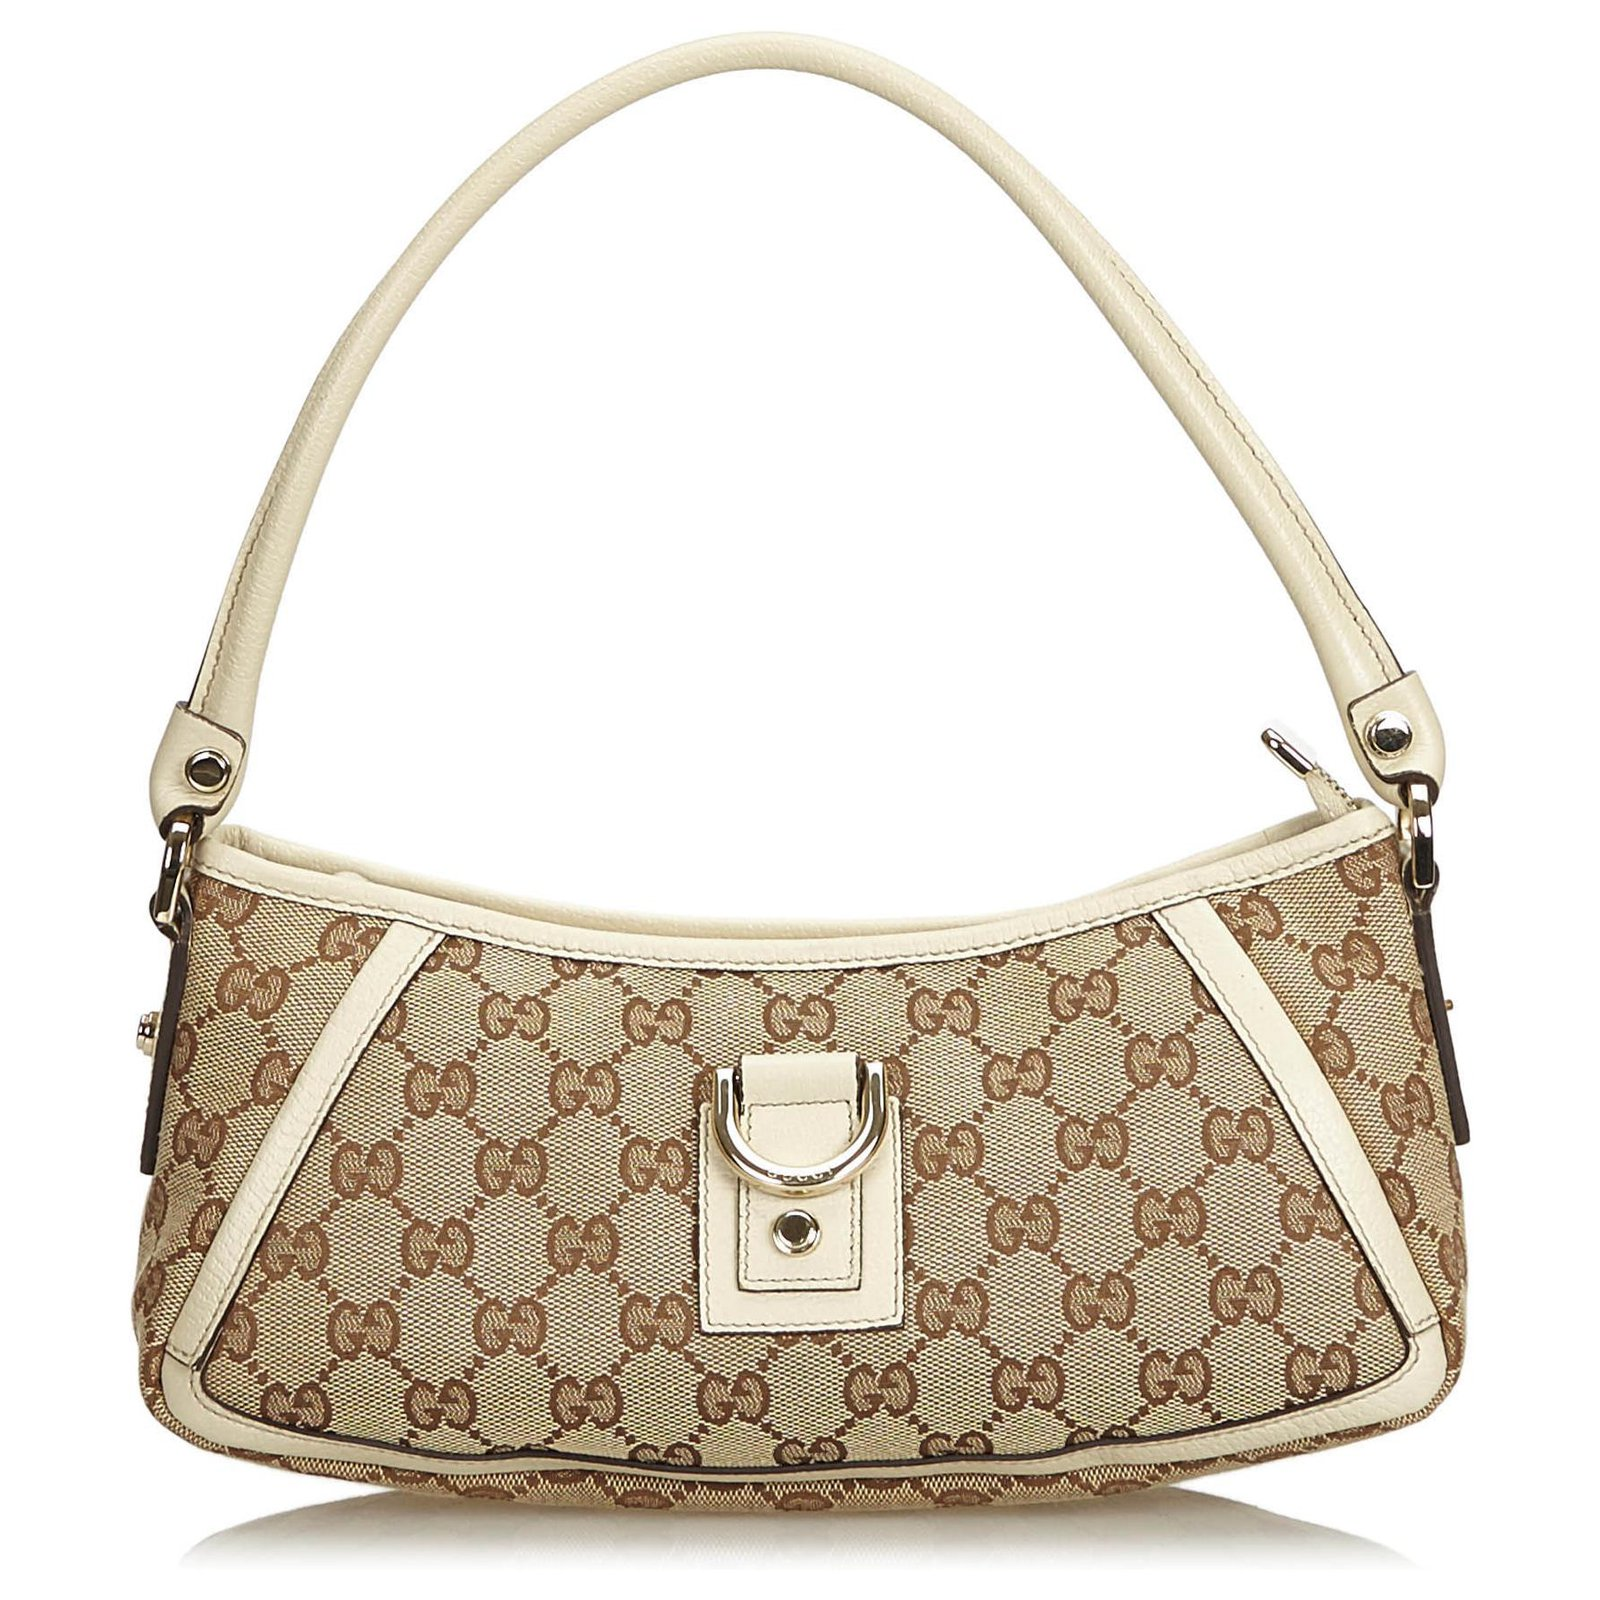 51b1092da46 Gucci Gucci Brown GG Jacquard D-Ring Abbey Baguette Handbags Leather ...